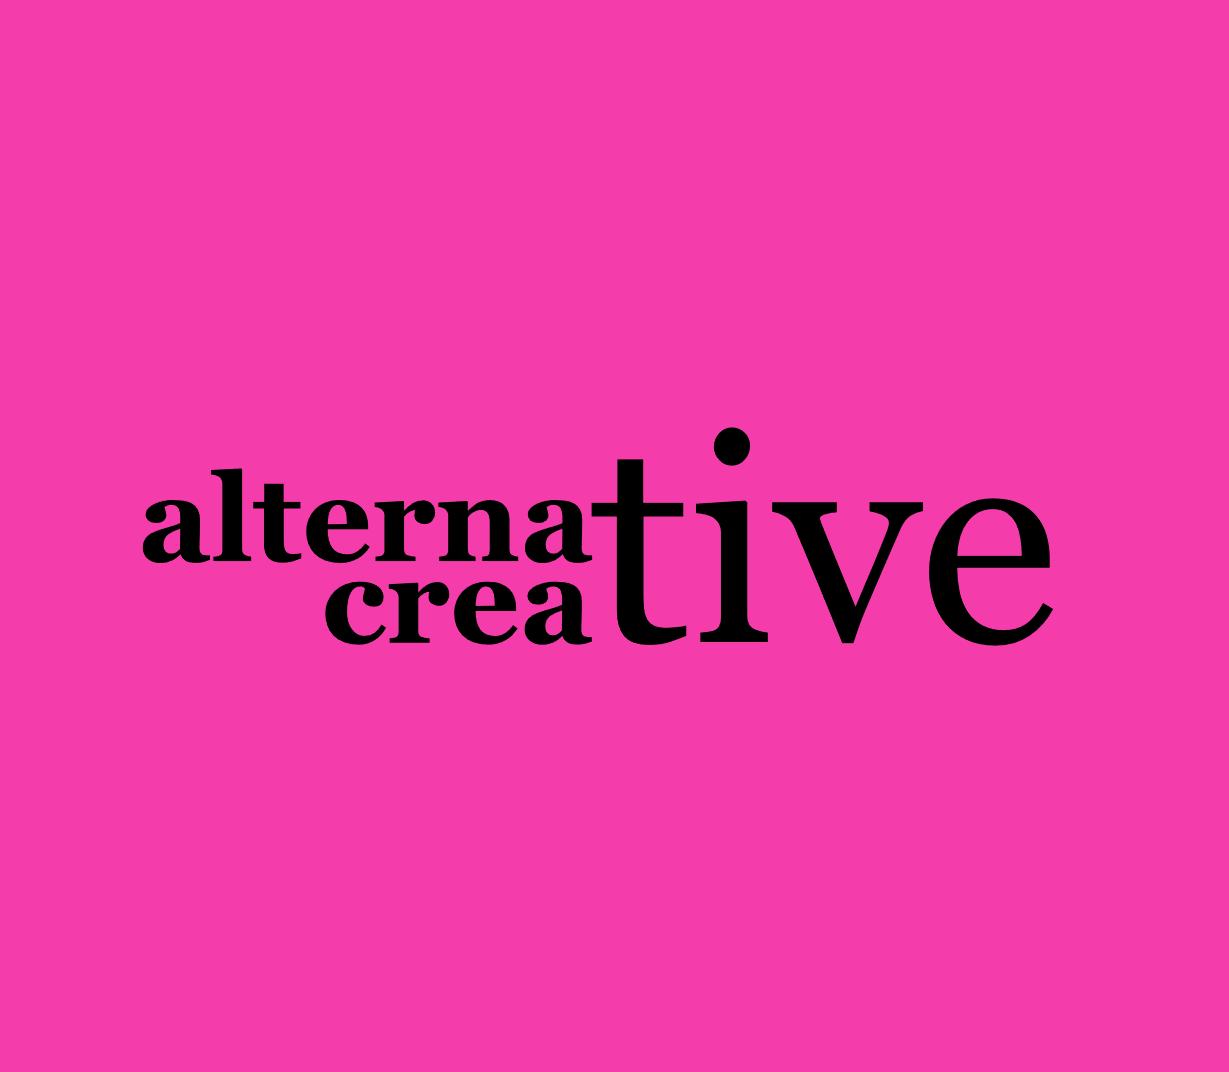 Alternative Creative